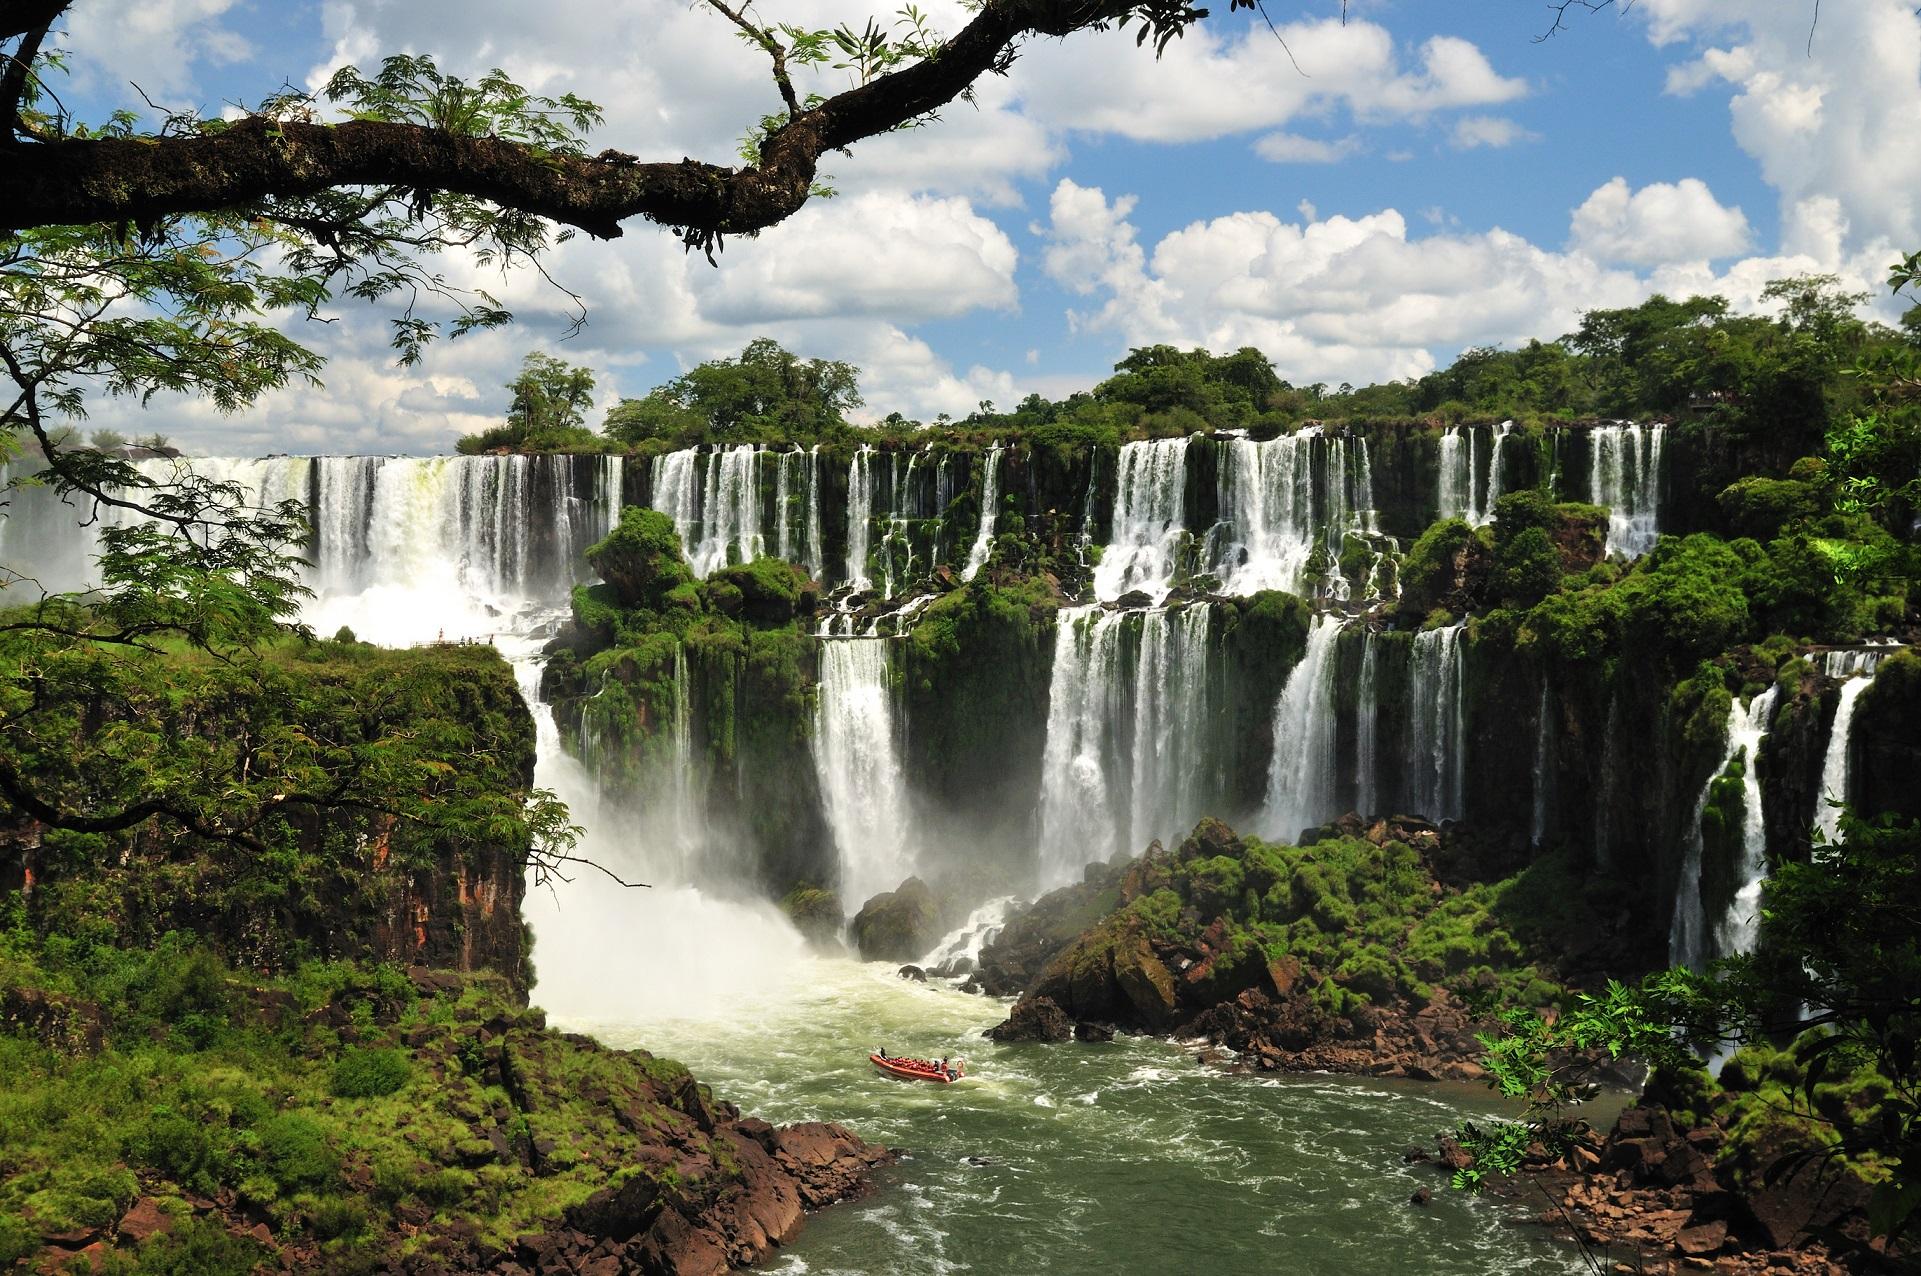 Iguazu Falls #3